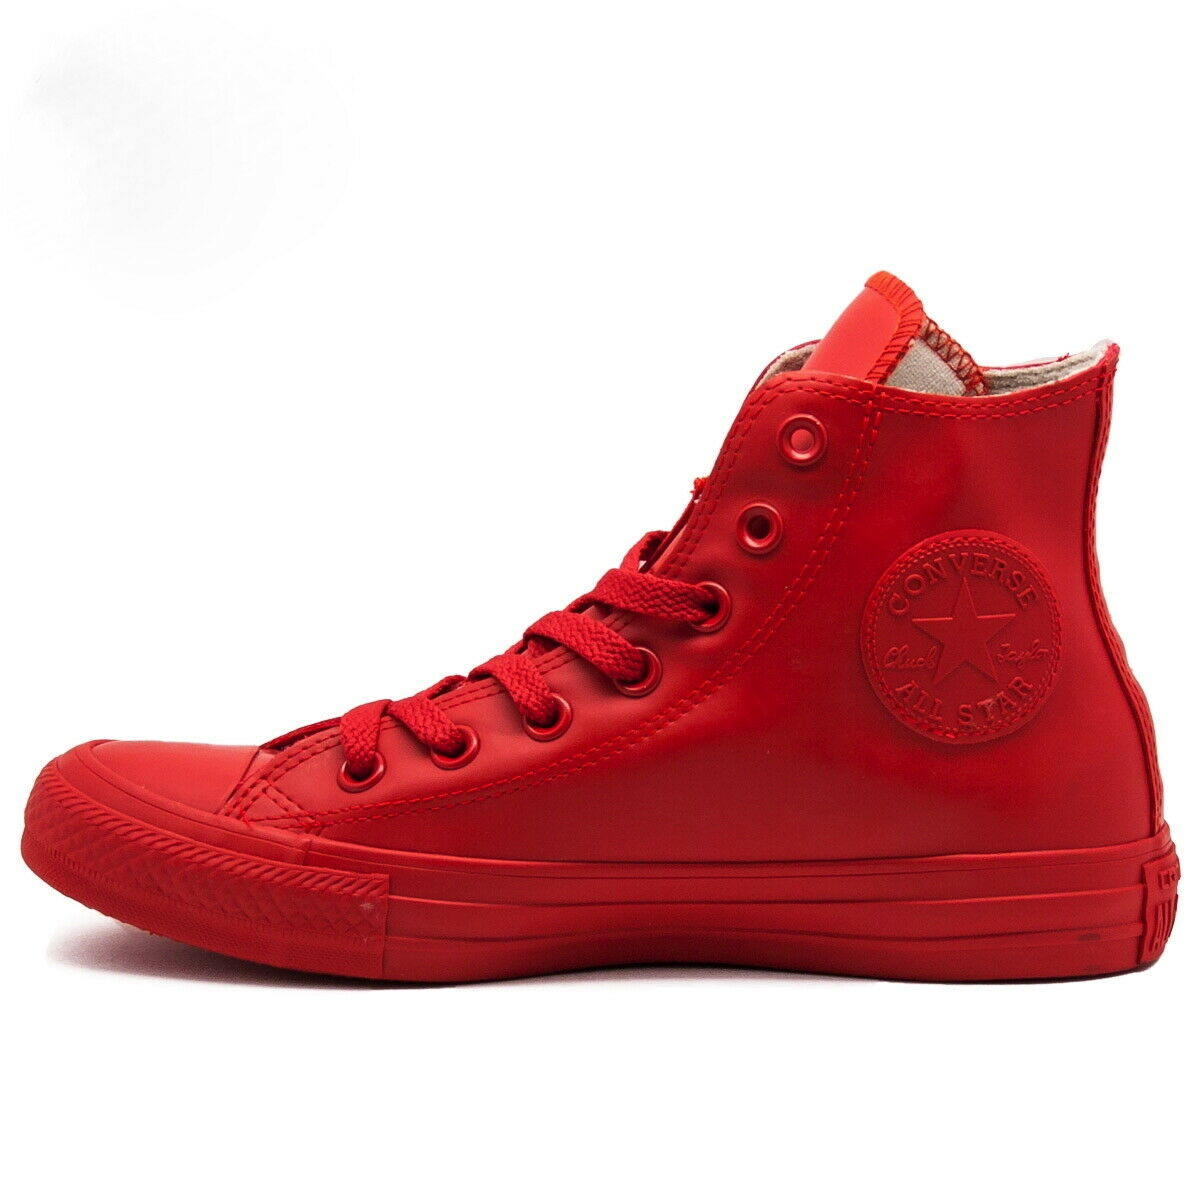 Men's Sport shoes  CONVERSE ALL STARS   144744C  LIMITED SALE